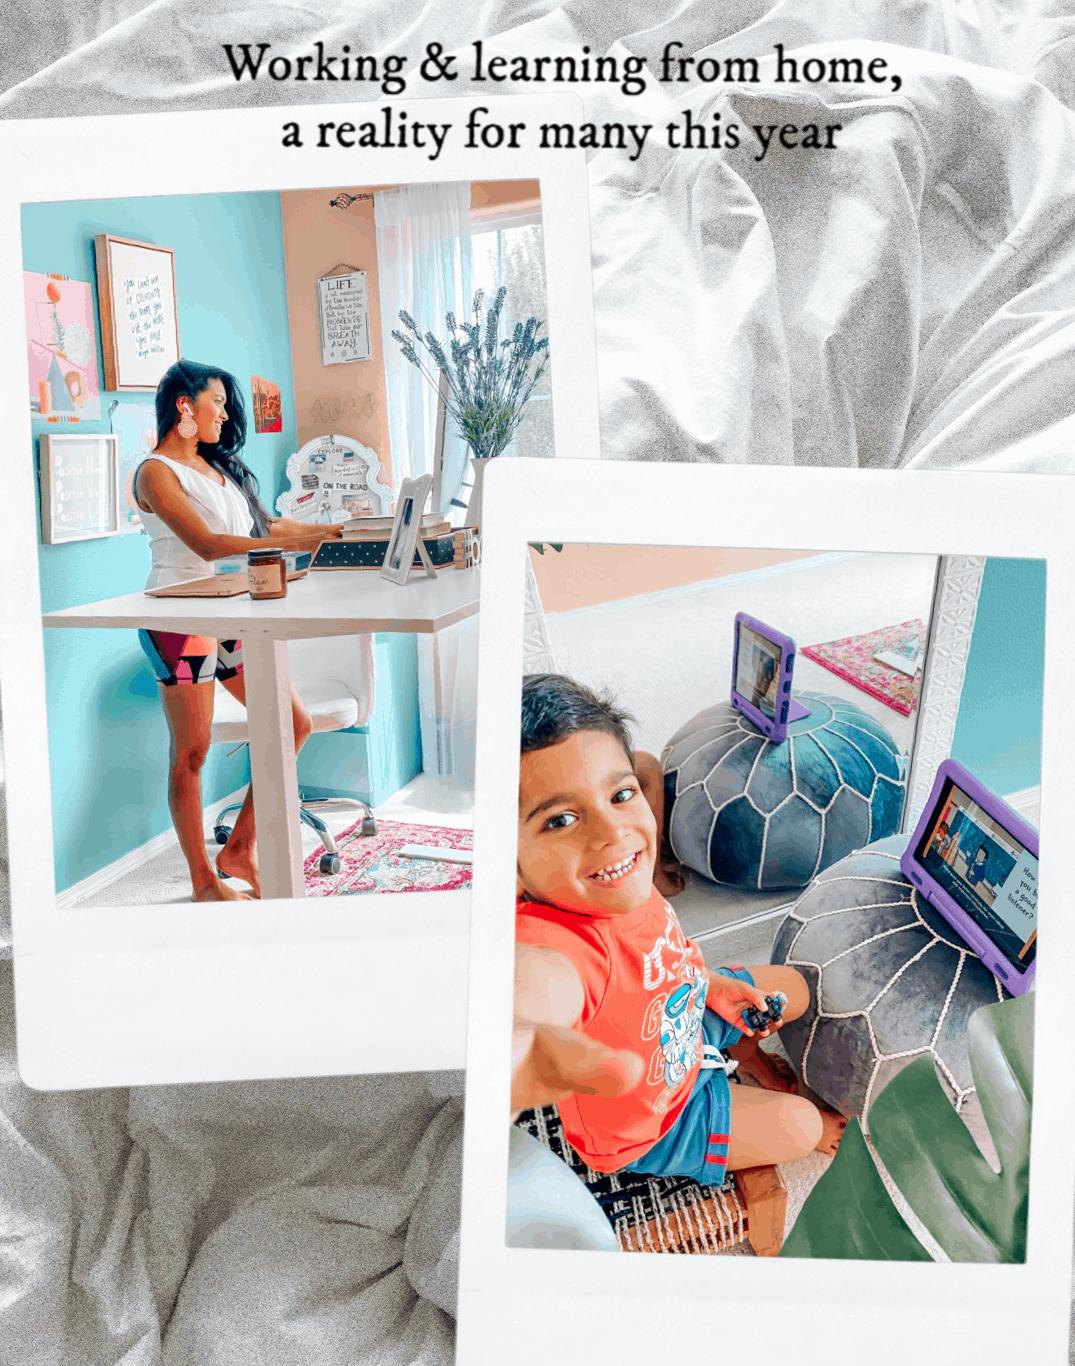 Homeschool Resources Home Office Workspace Kids Tablet Education Apps Alexa